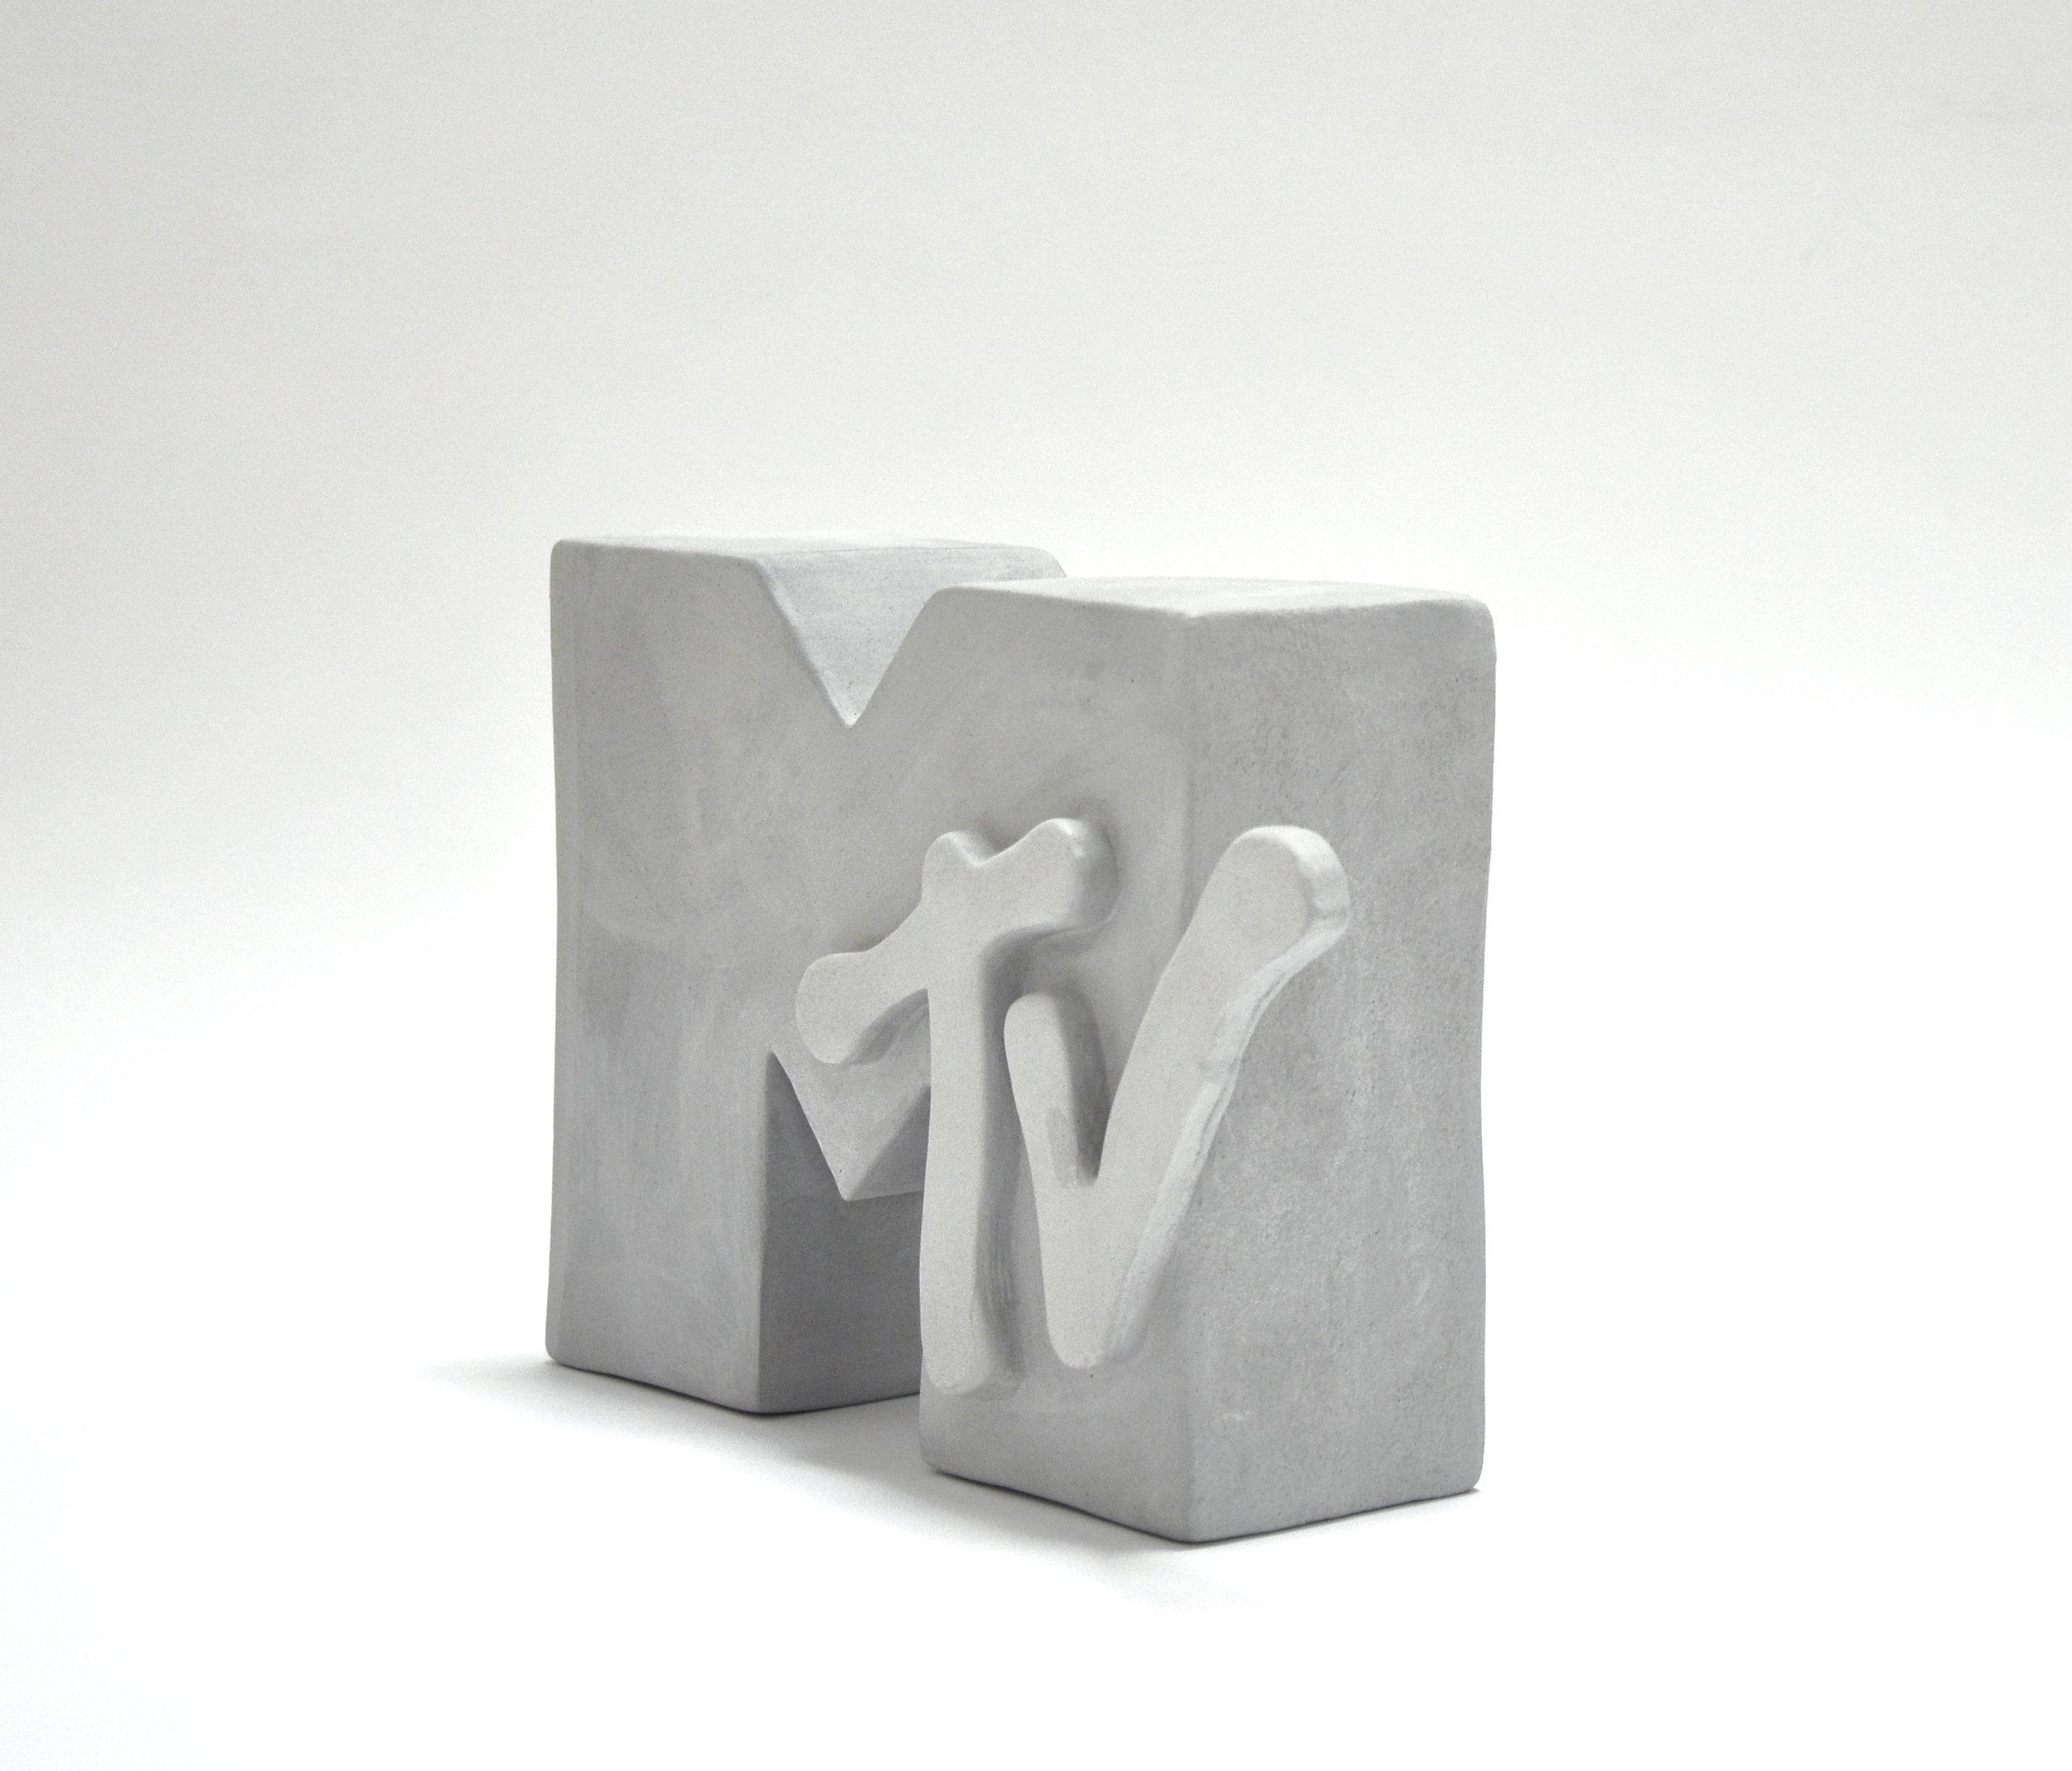 MTV Protoype, Circa 1990, Unfired Clay, 7 x 10 x 3″, 2016